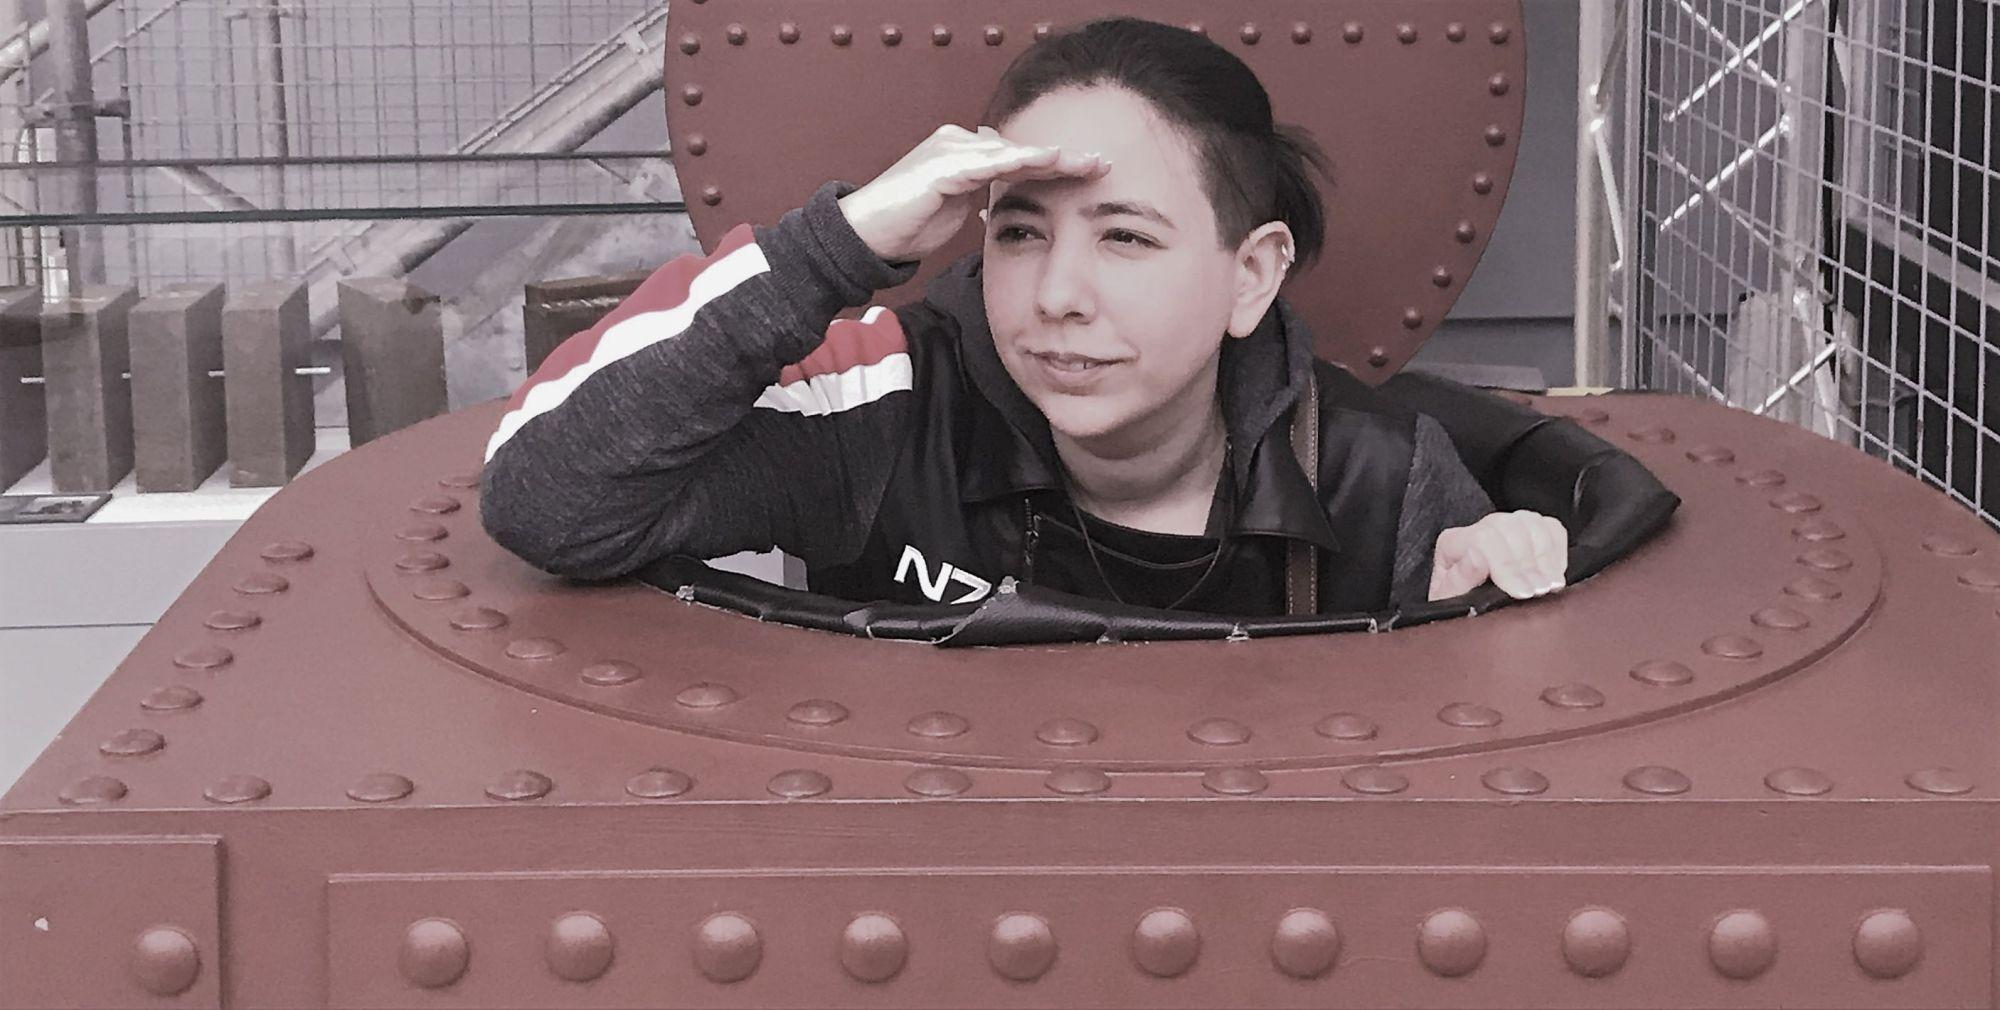 Tank commander Sam